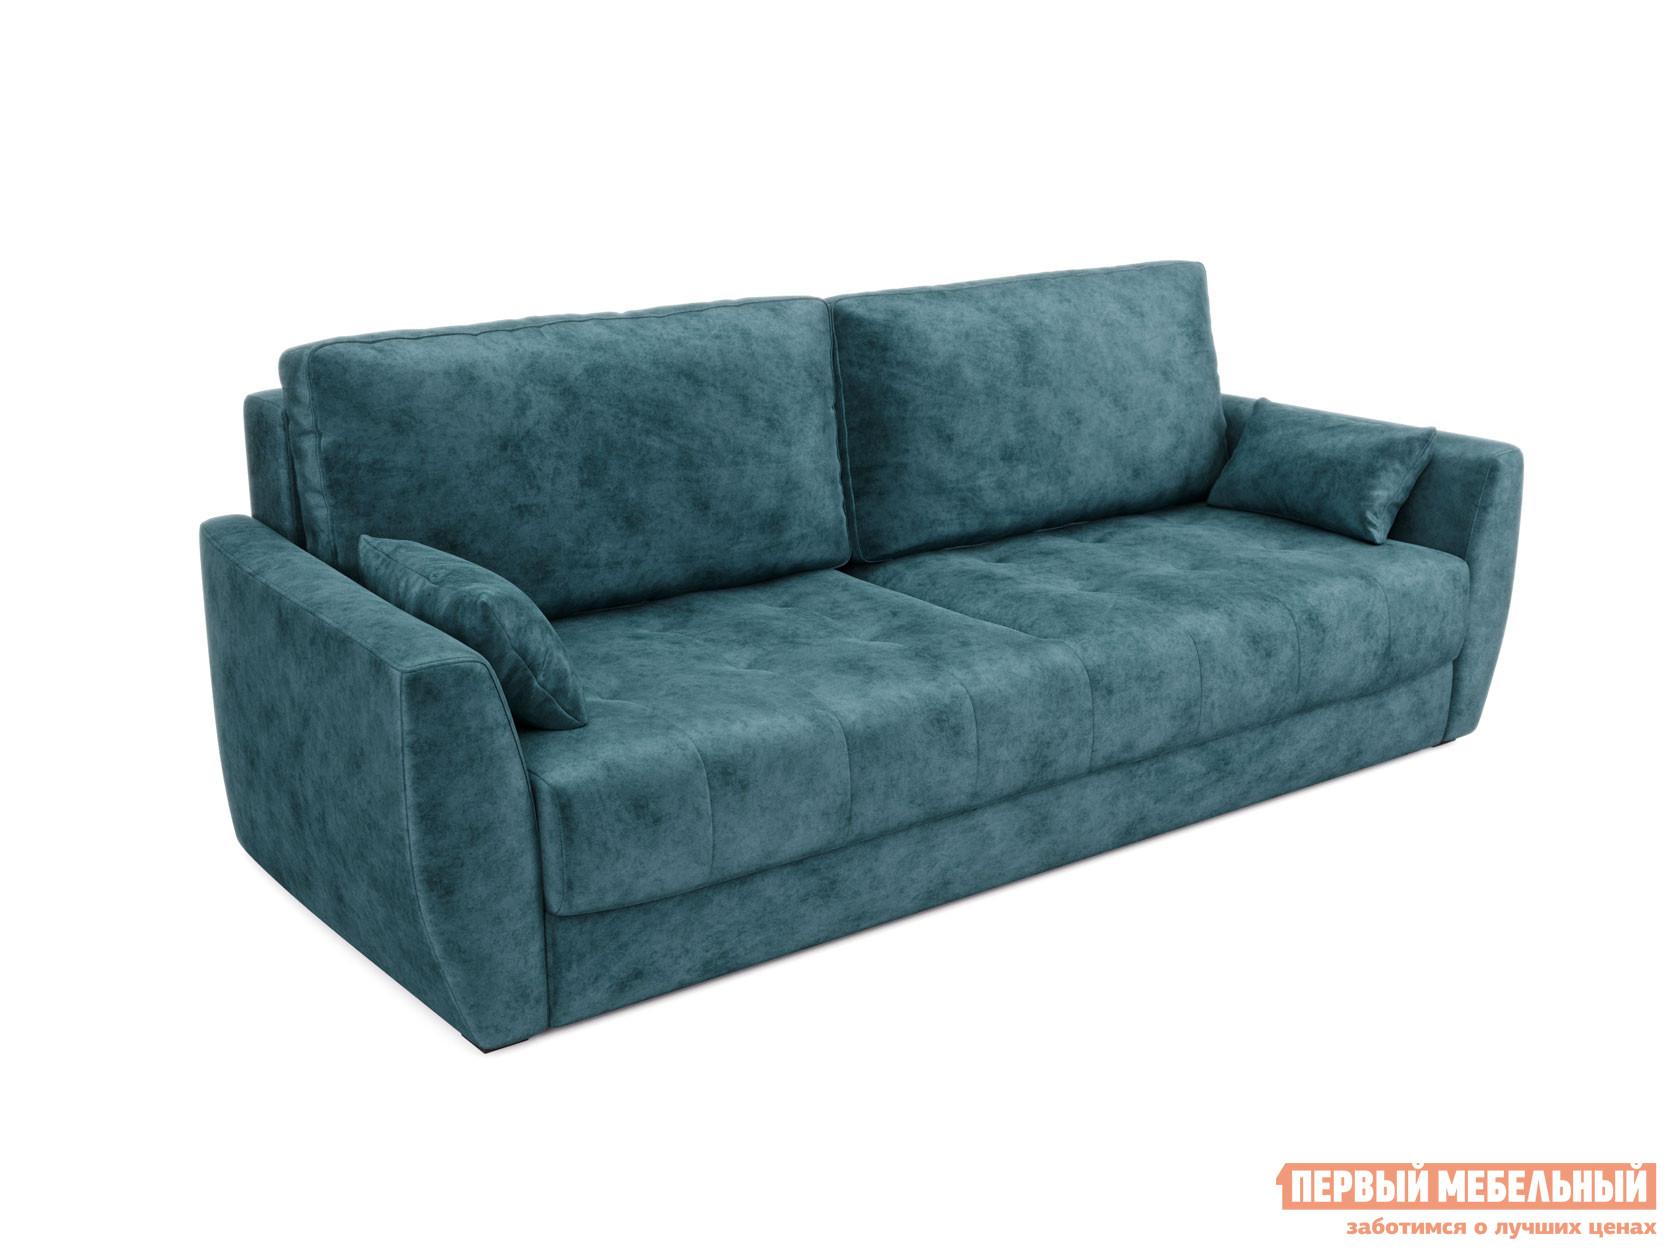 Прямой диван  Тиволи Люкс Мята, велюр Пиррогрупп 93618